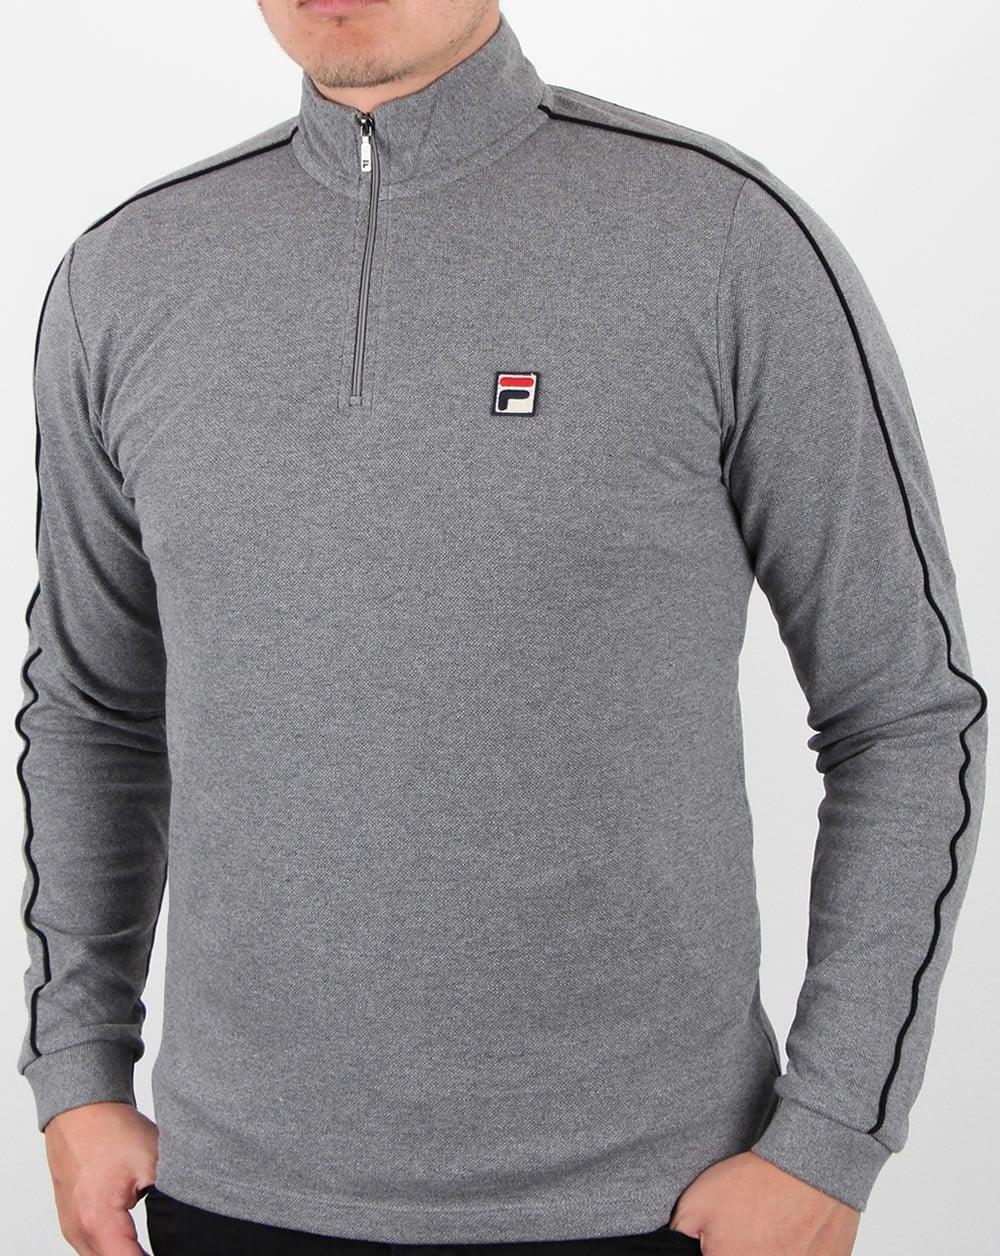 c0c53735f56e Fila Vintage Parrini Zip Neck Polo Grey Twist,zipped,long sleeve,mens